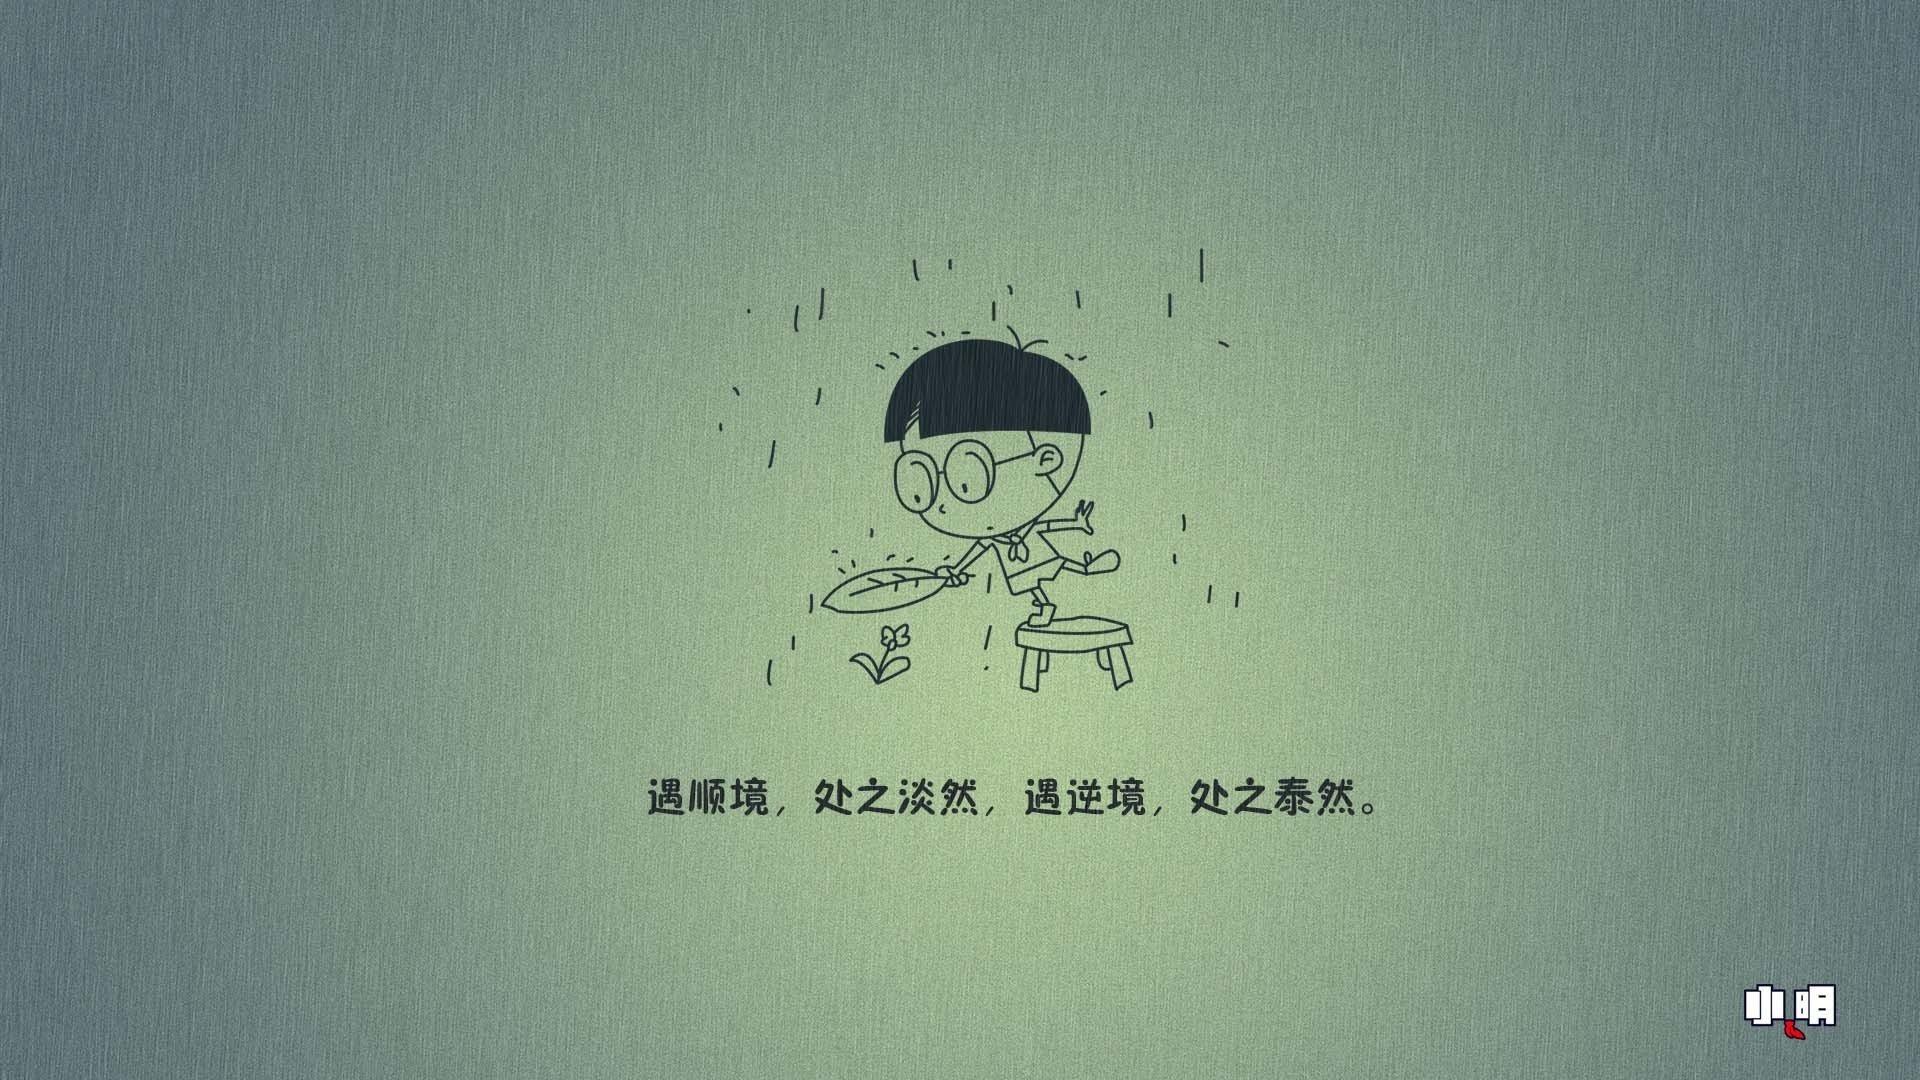 android安卓动漫 卡通 小明 手绘 励志 可爱高清手机